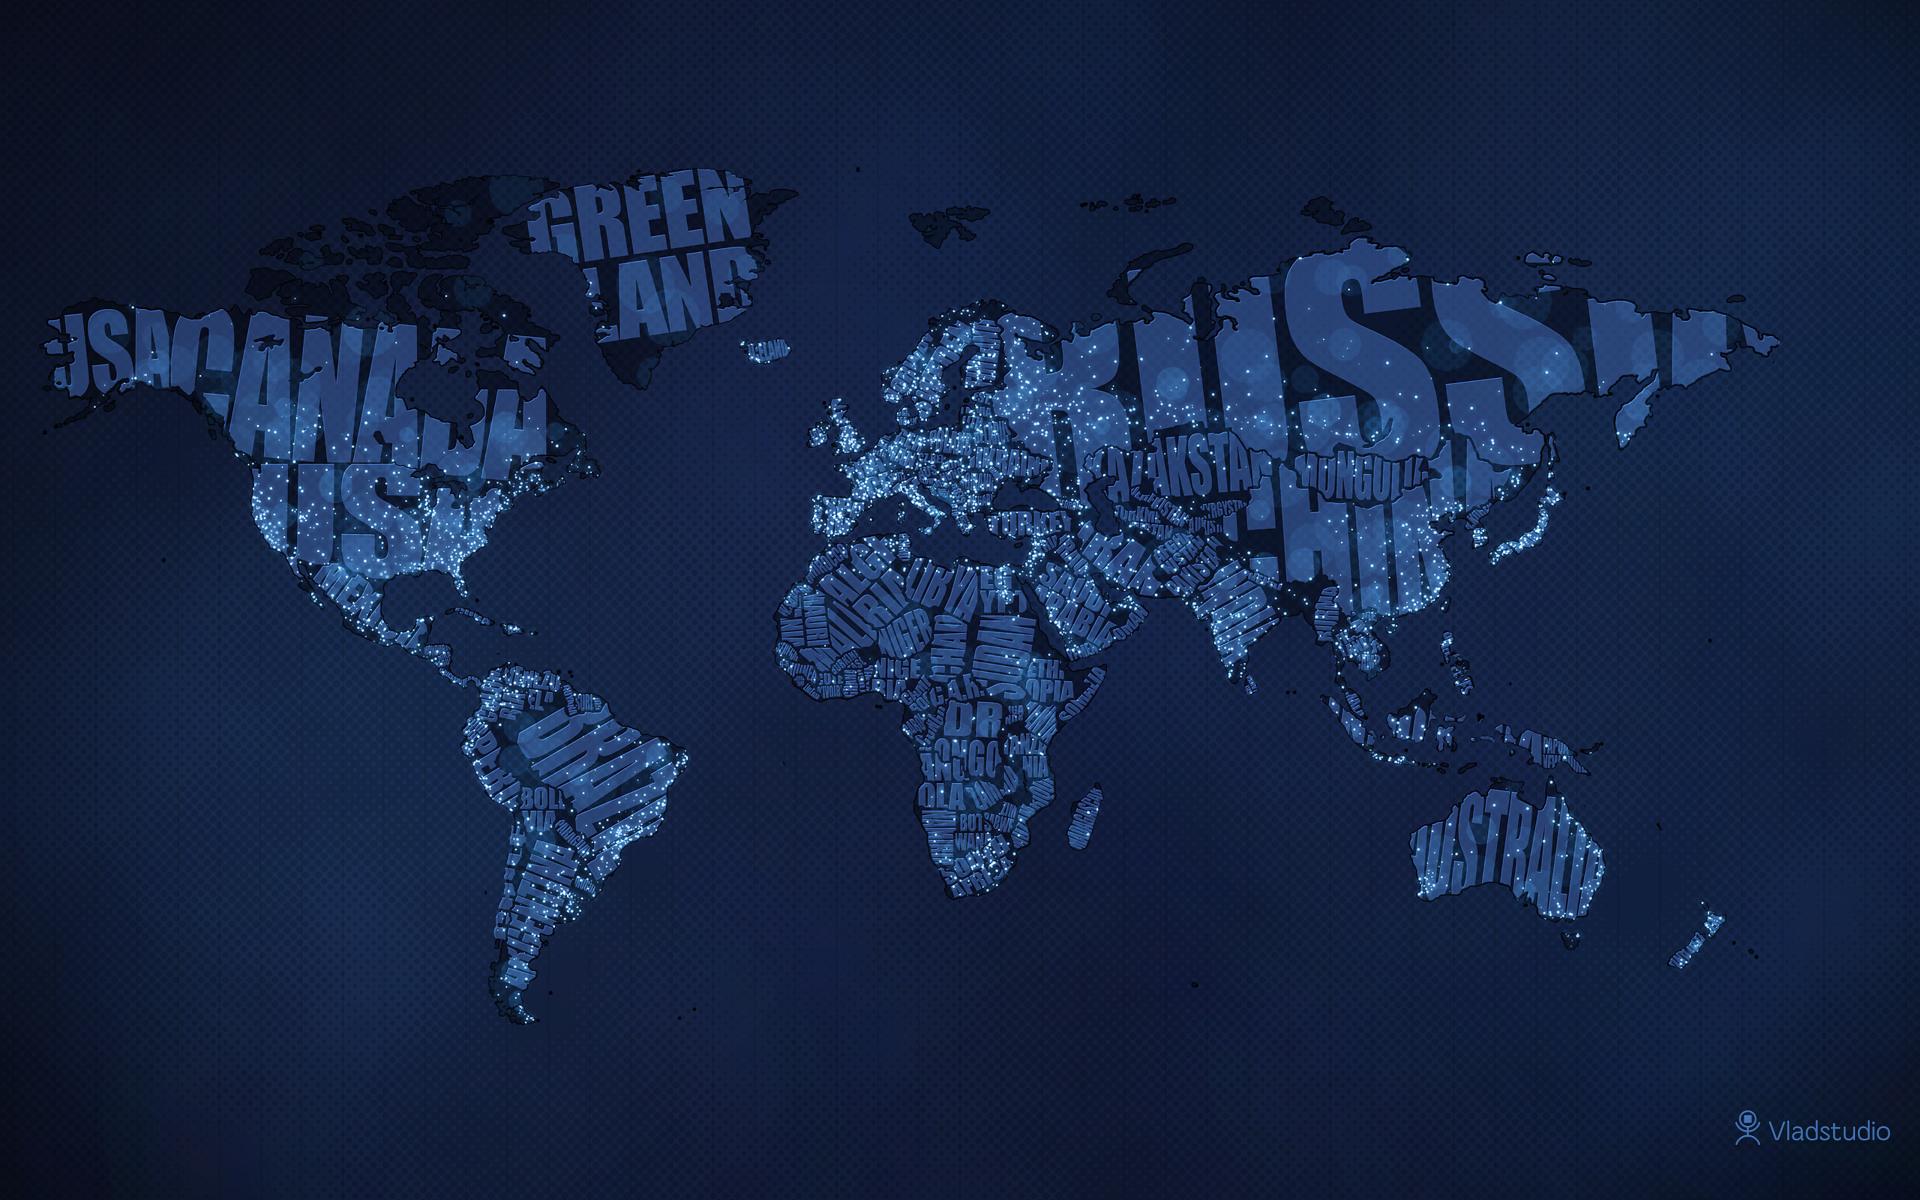 Typographic World Map Night by vladstudio 1920x1200